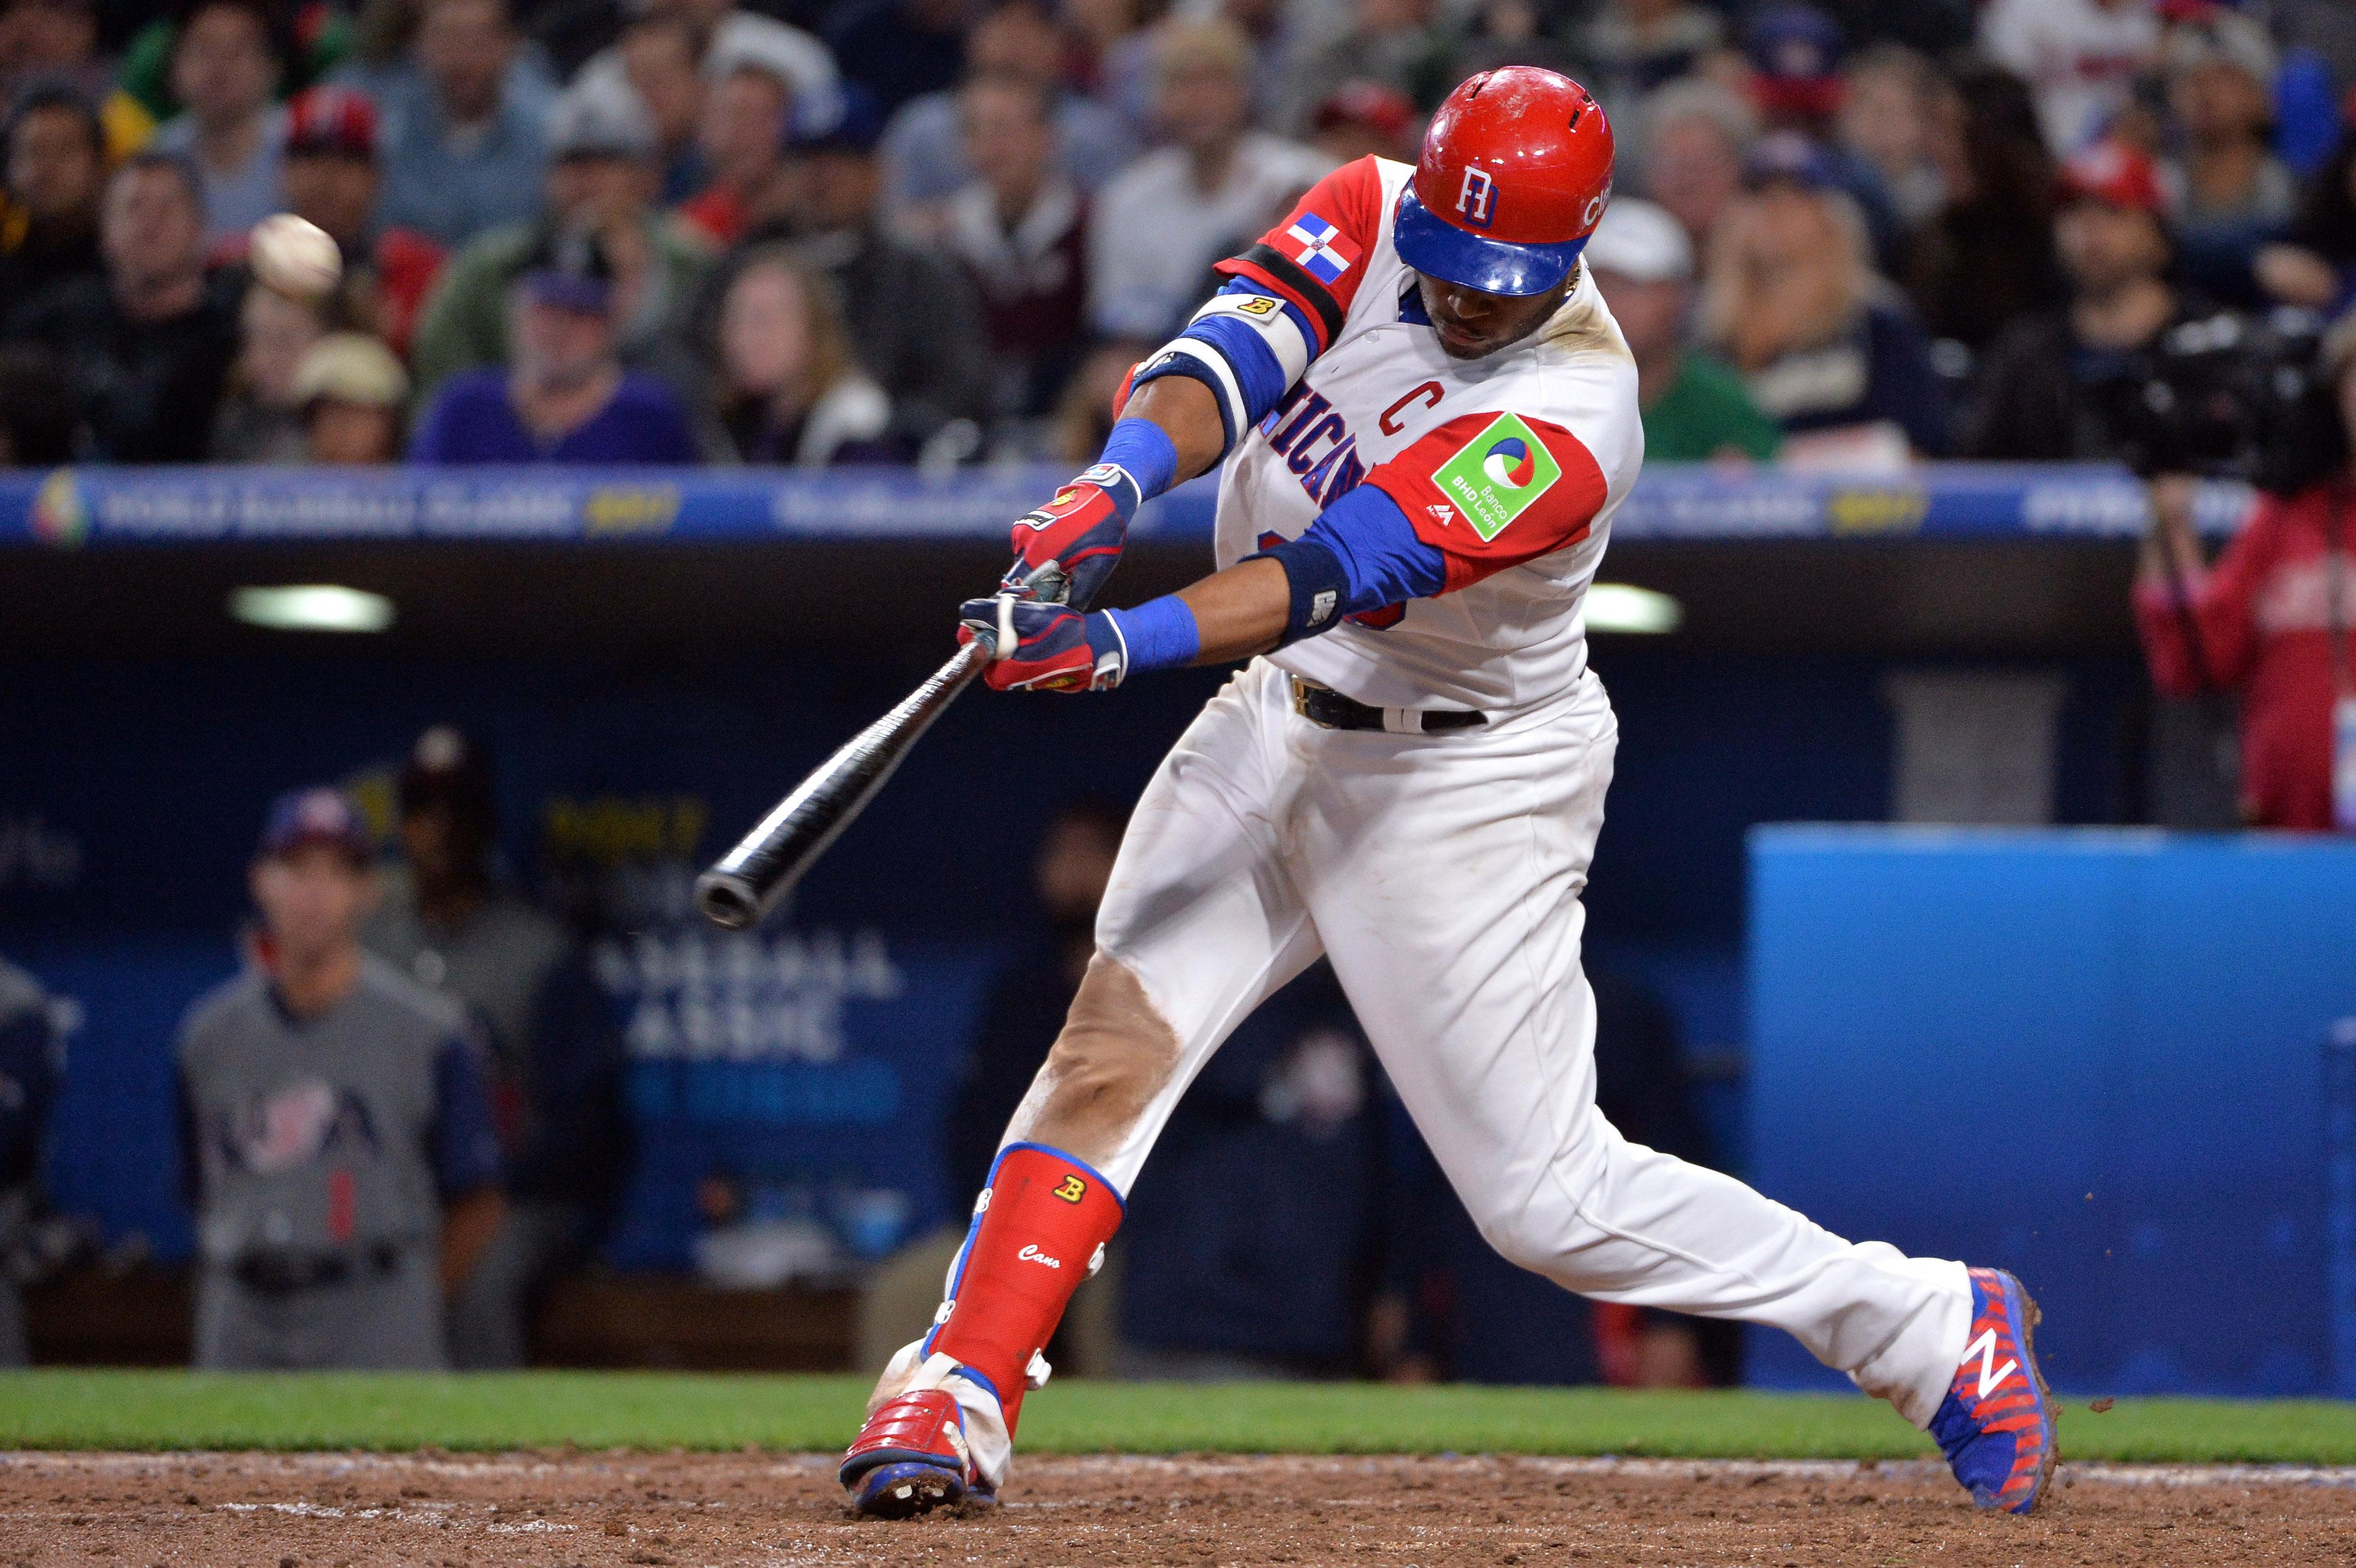 9955680-baseball-world-baseball-classic-usa-at-dominican-republic